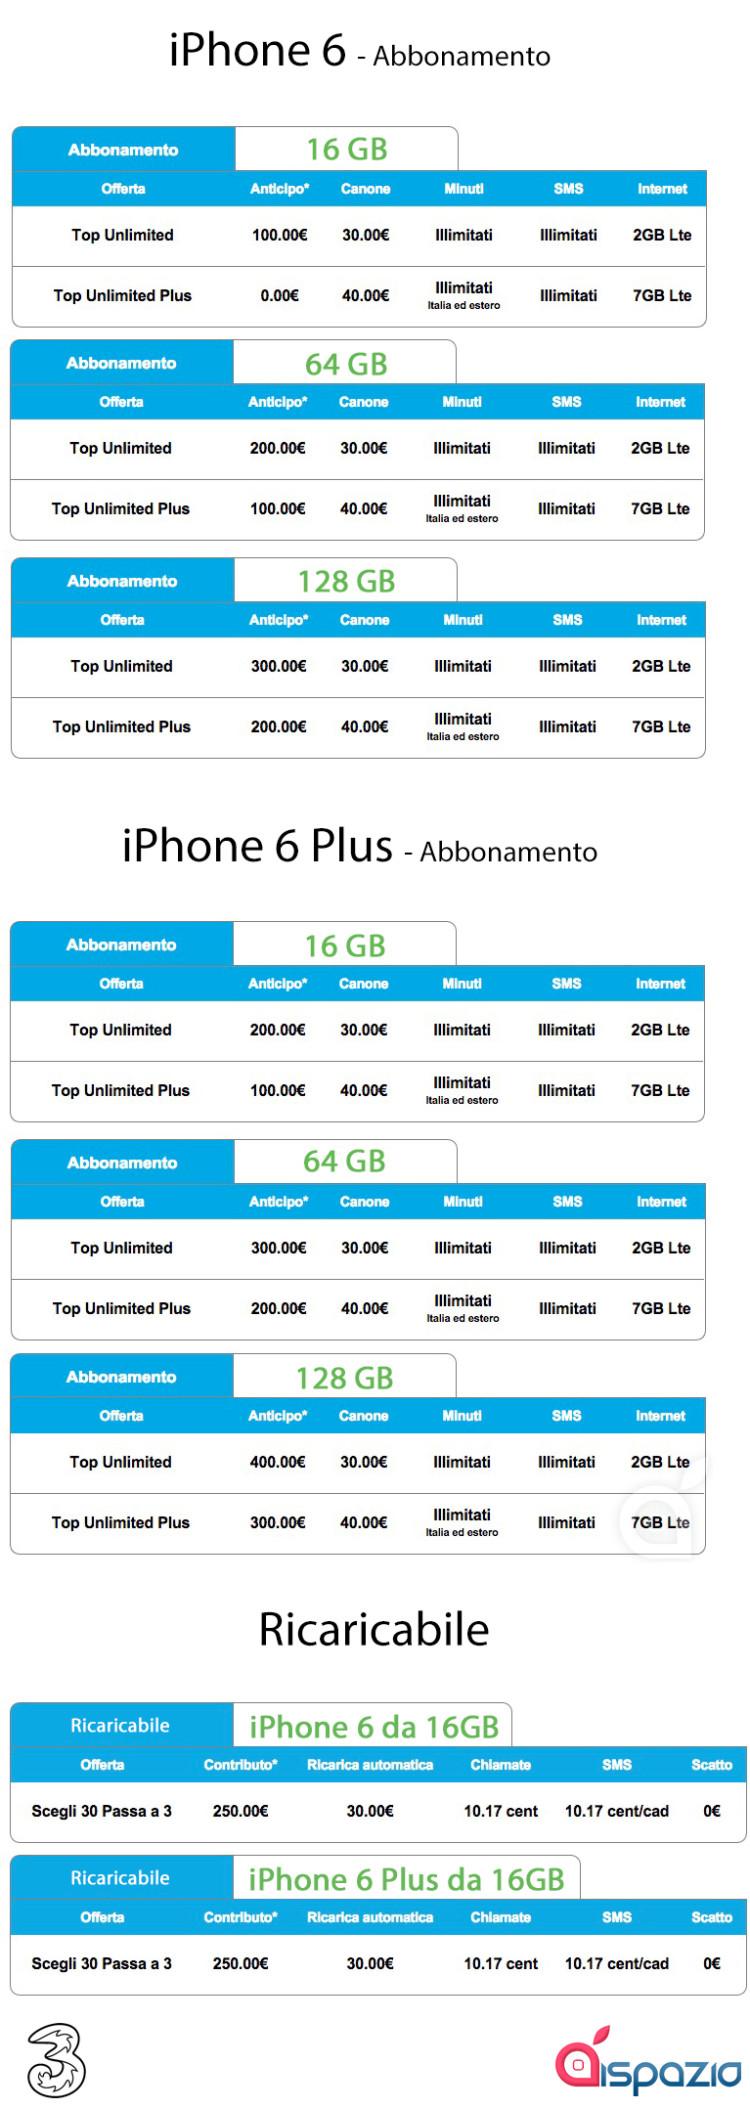 iphone-6-tariffe-abbonamento-3-italia